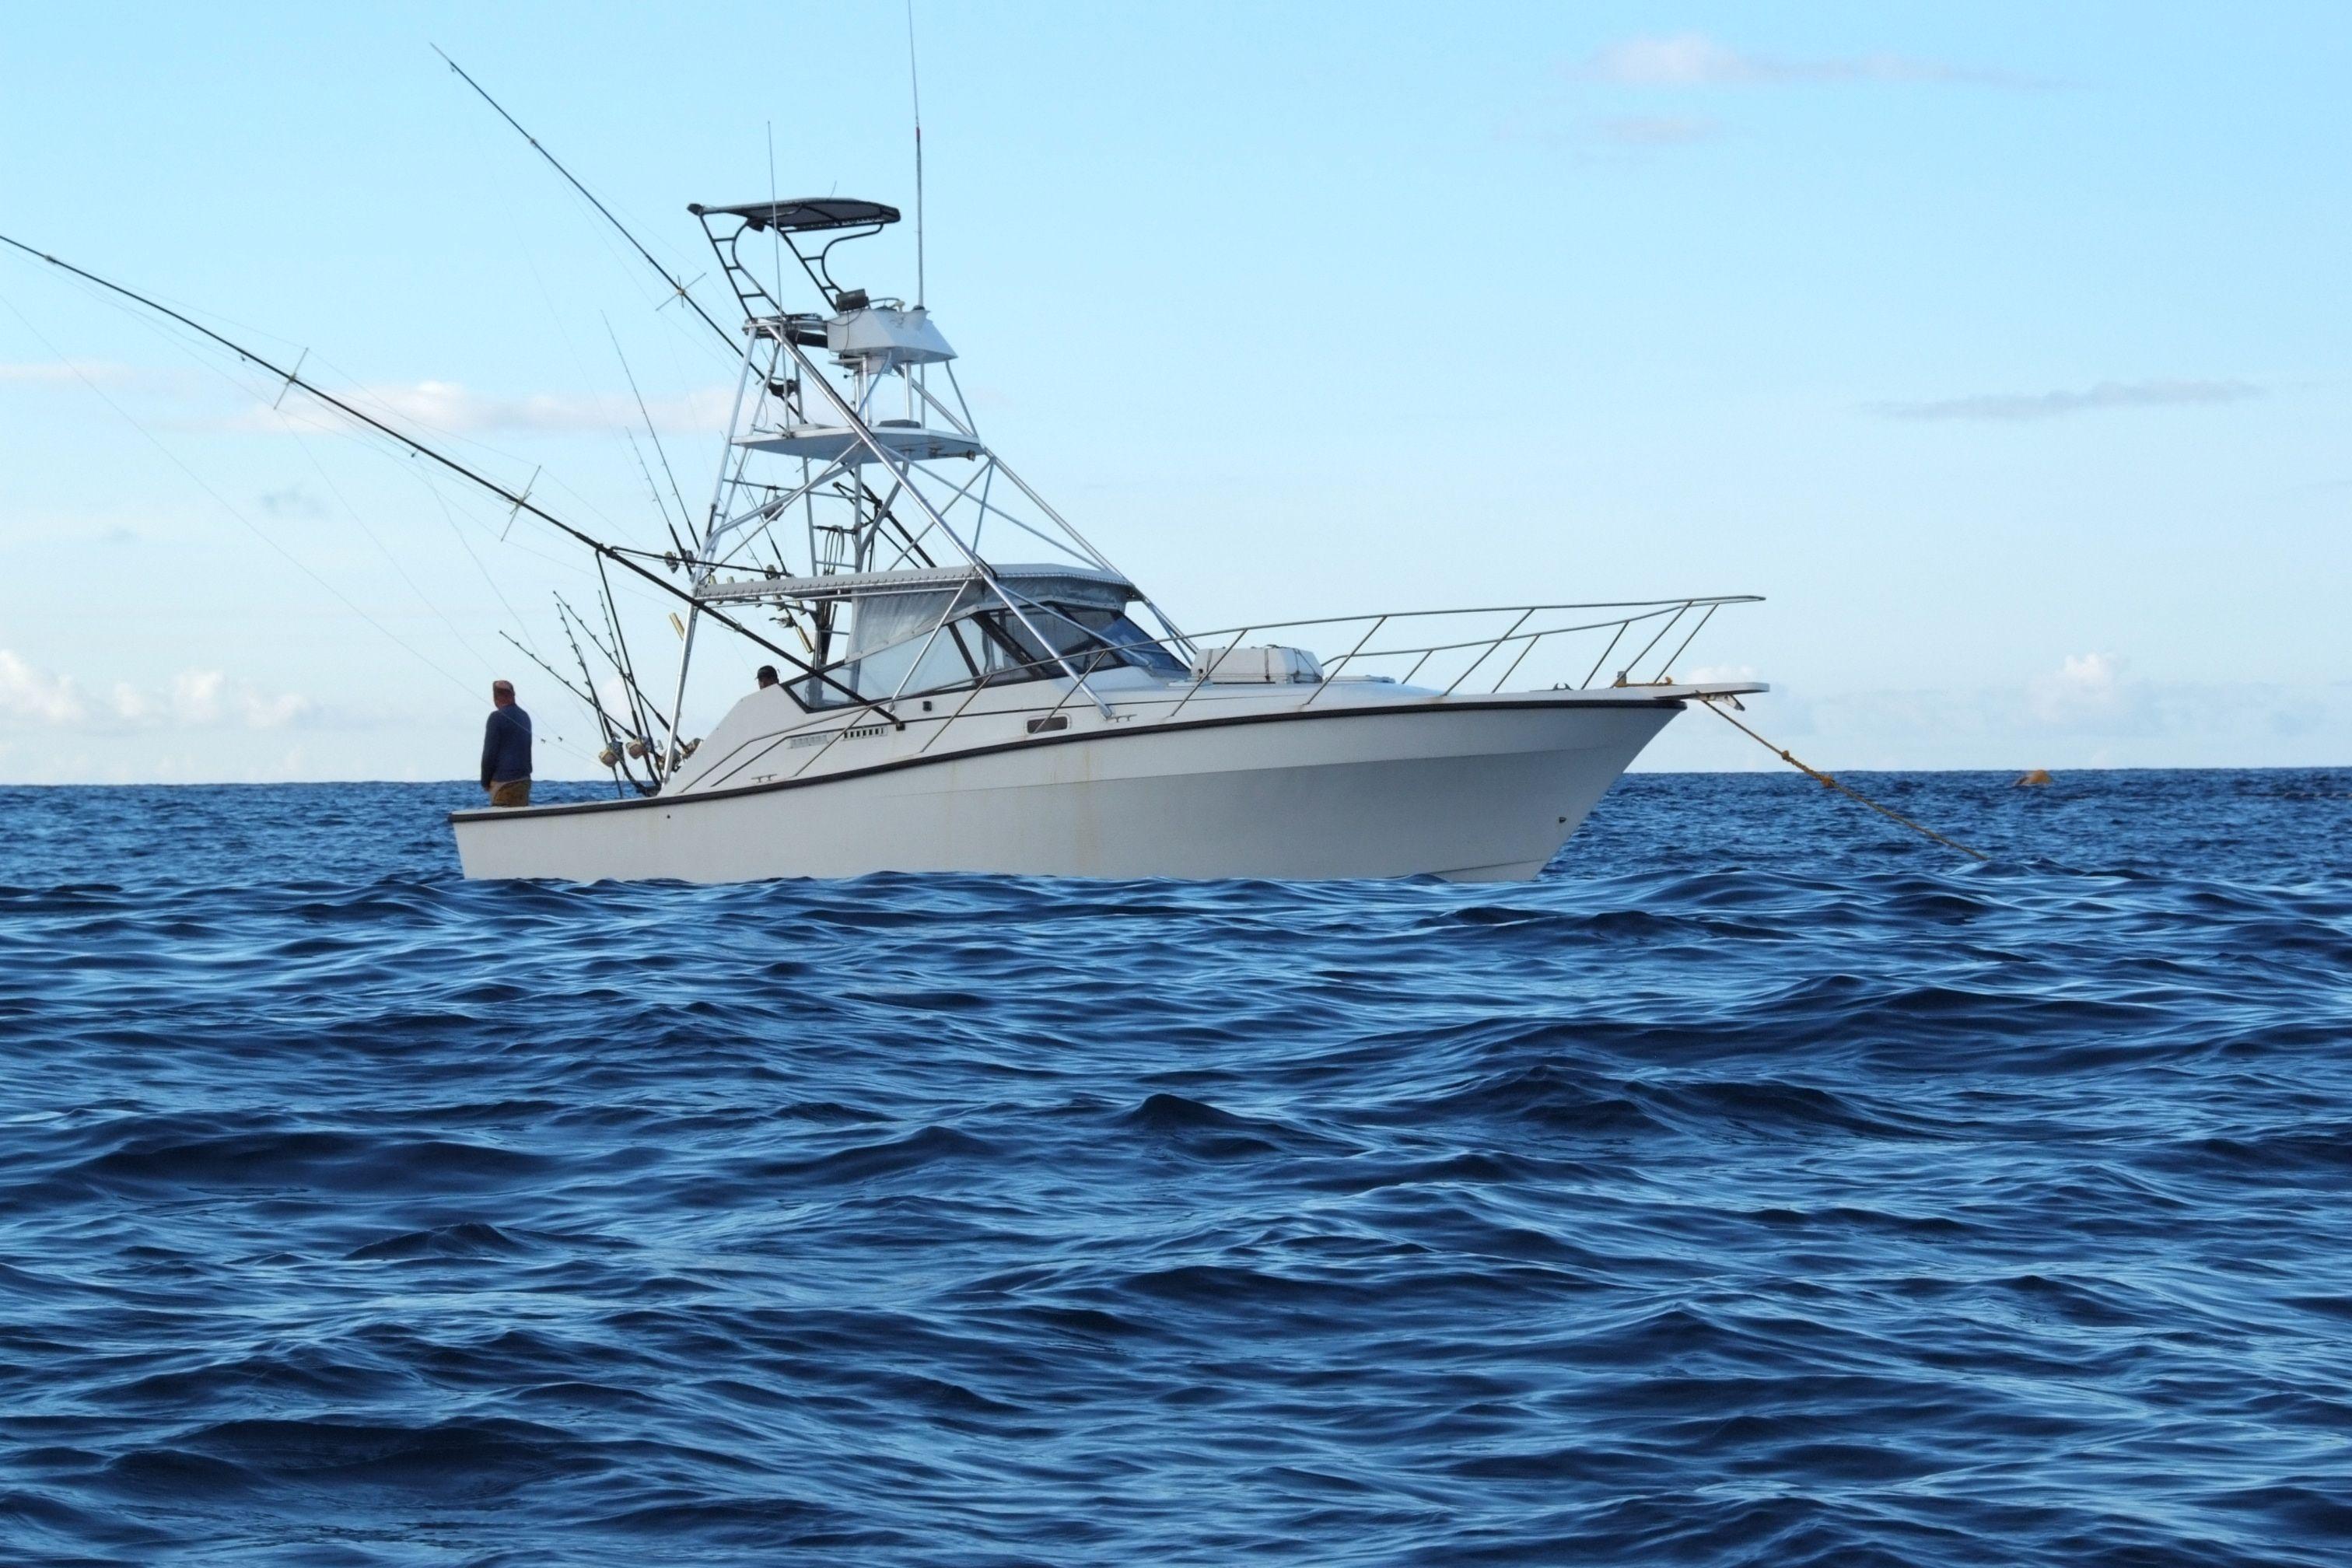 Ascension Island Blue Marlin Big Game Fishing | Boats | Pinterest ...